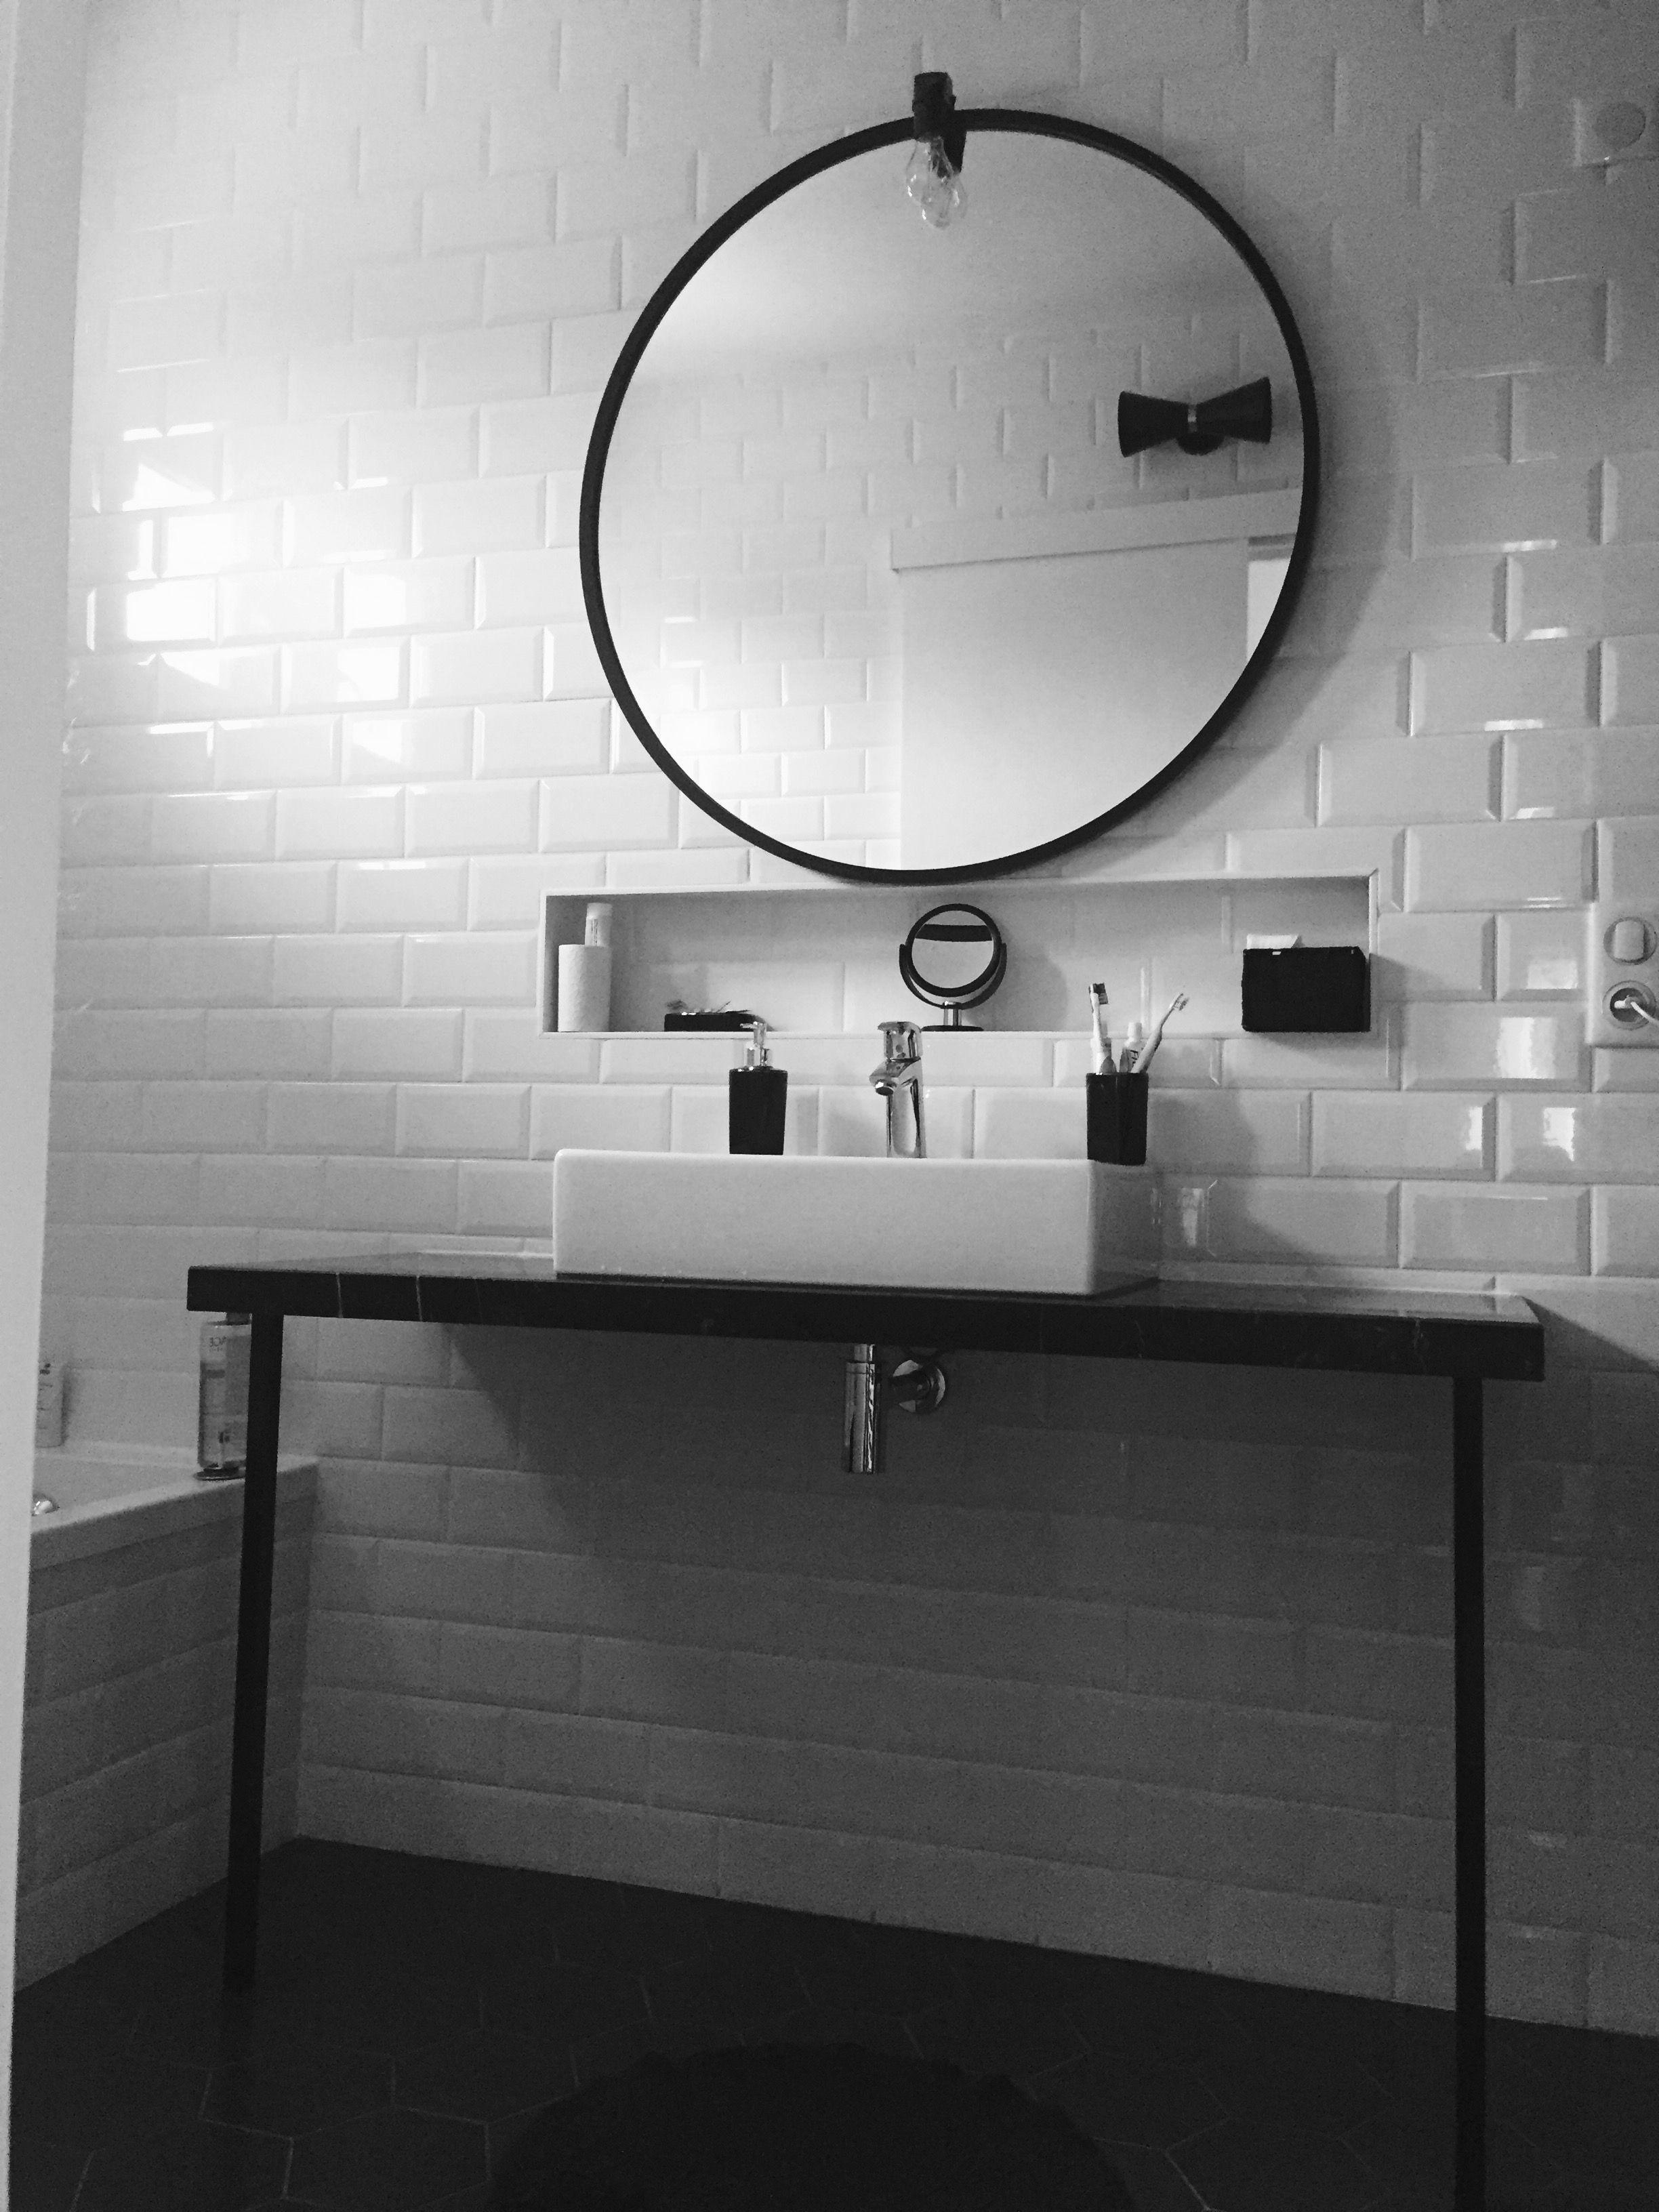 Miroir Sympa Salle De Bain ~ salle de bain vintage plan vasque marbre miroir umbra grand format